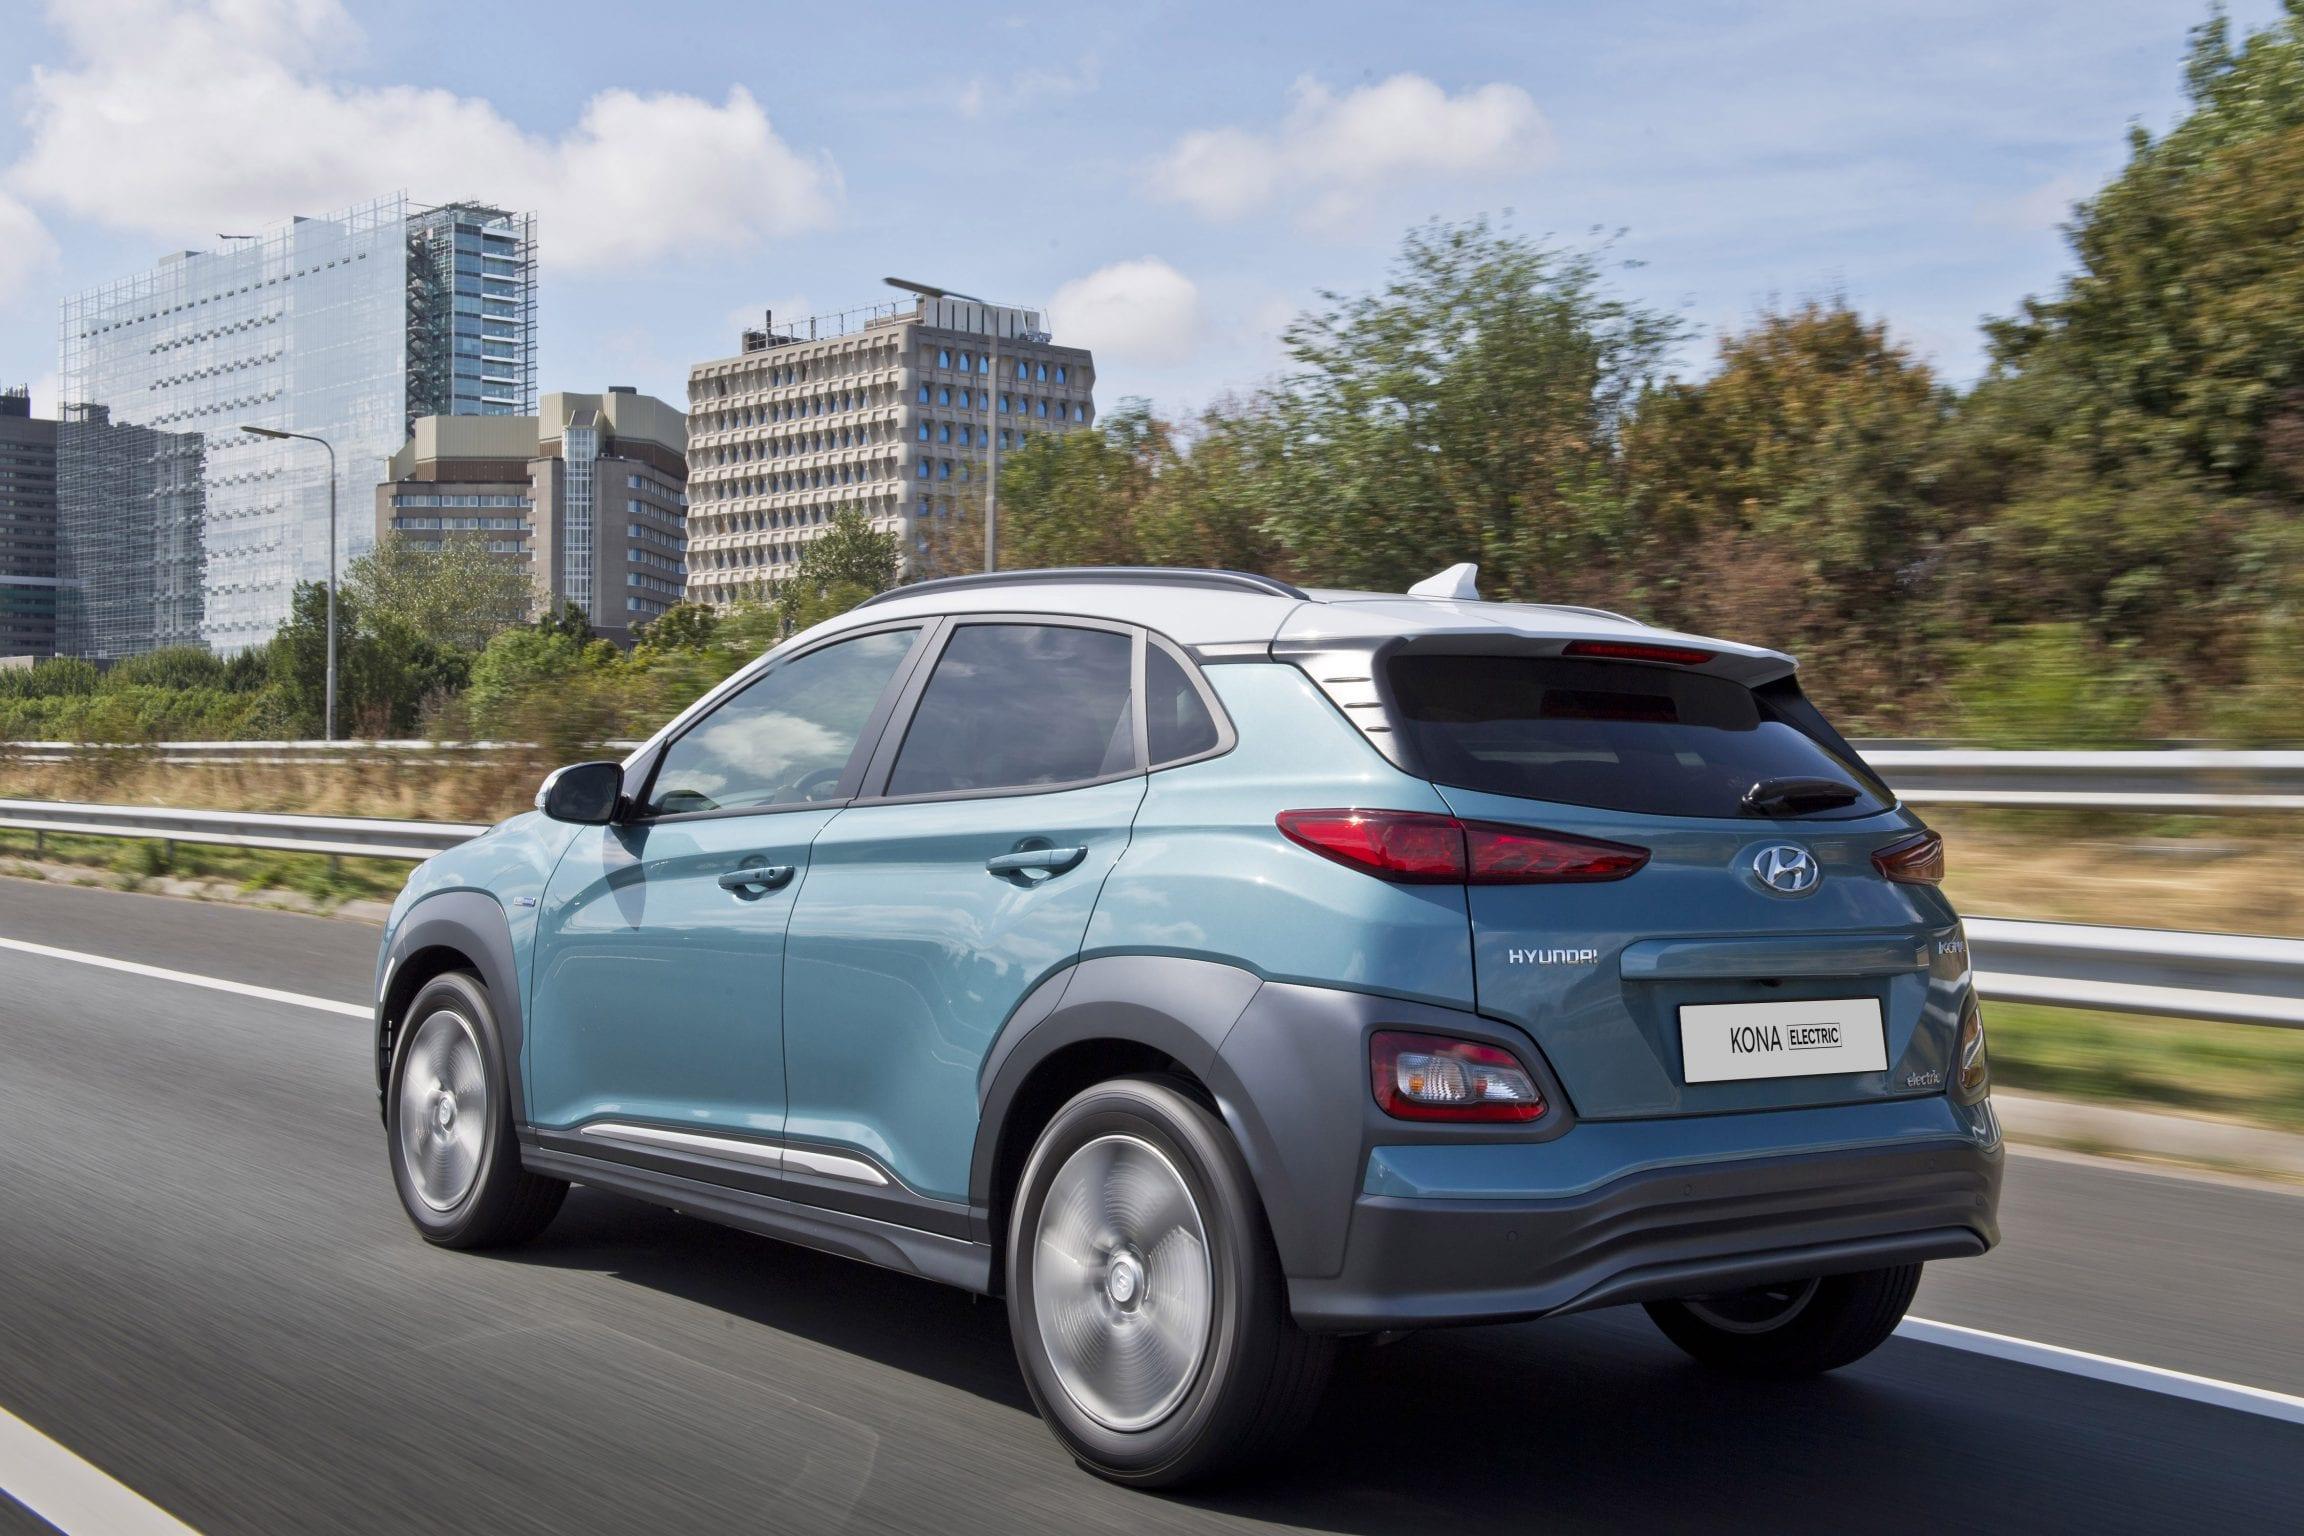 Hyundai Kona EV Comfort Smart 64 kWh 8% Bijtelling